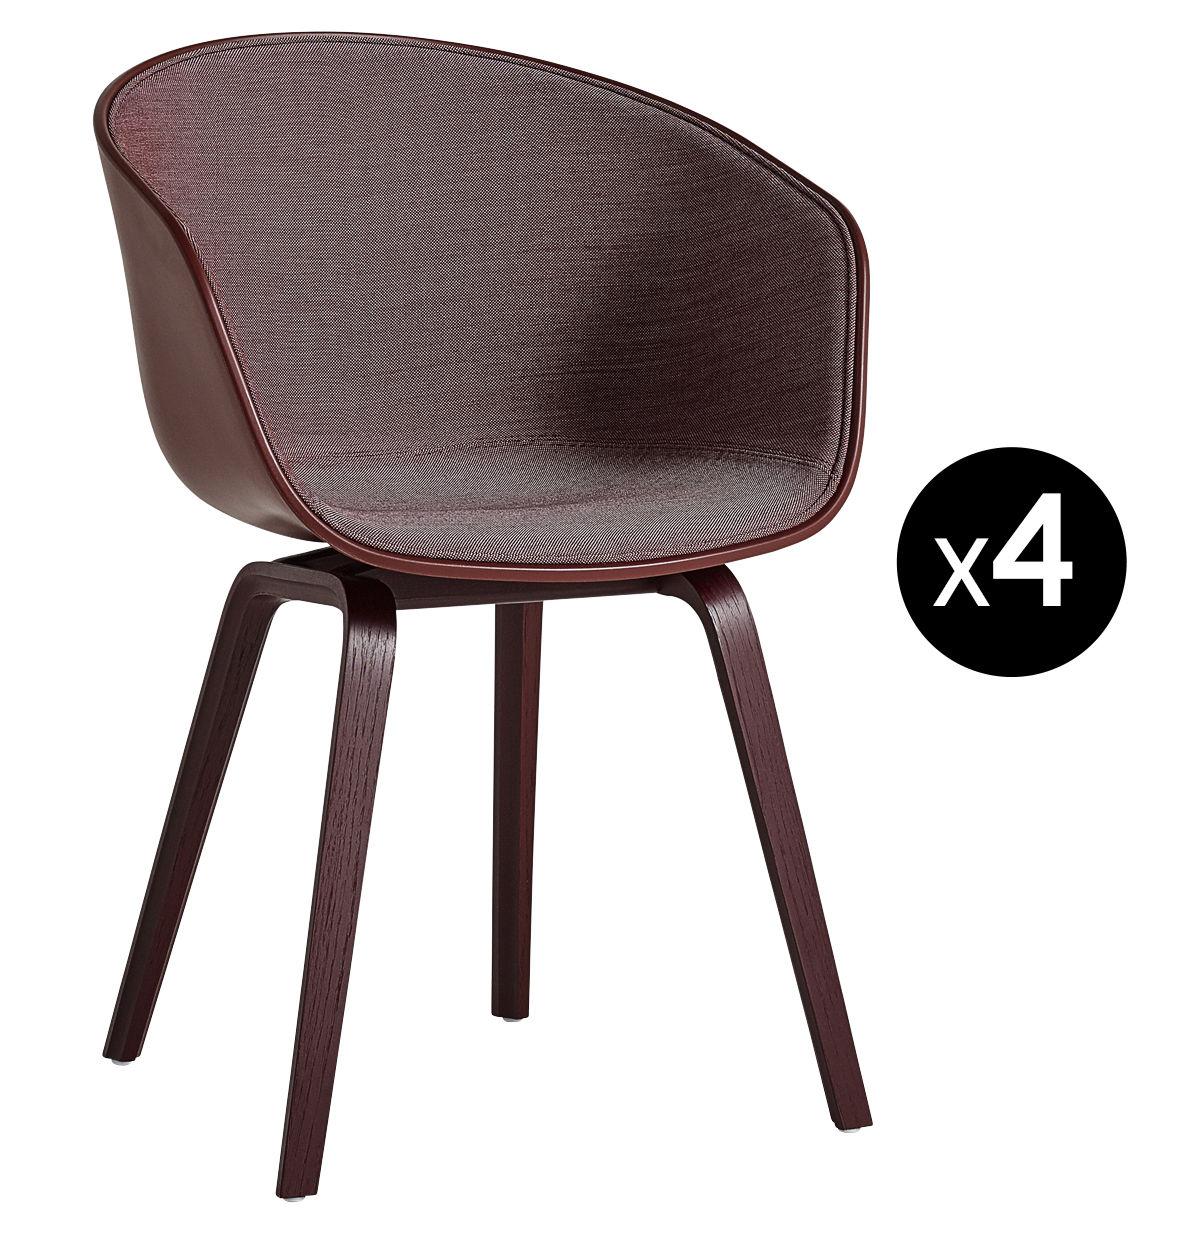 scopri poltrona imbottita about a chair aac22 bordeaux tessuto prugna struttura bordeaux di. Black Bedroom Furniture Sets. Home Design Ideas